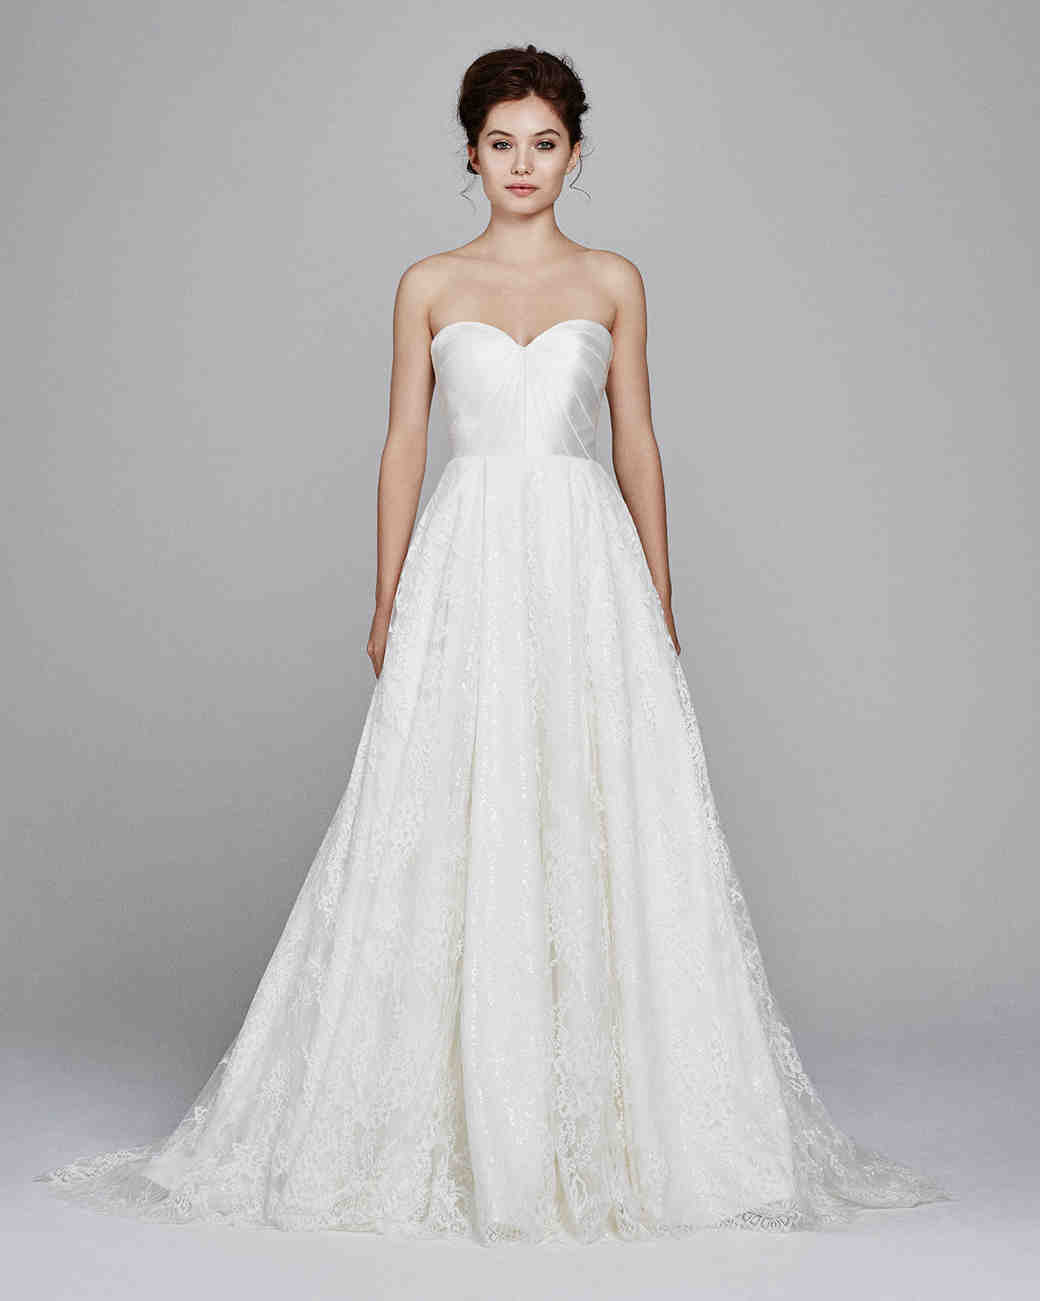 Wedding Dresses California 99 Popular Kelly Faetanini Fall Wedding